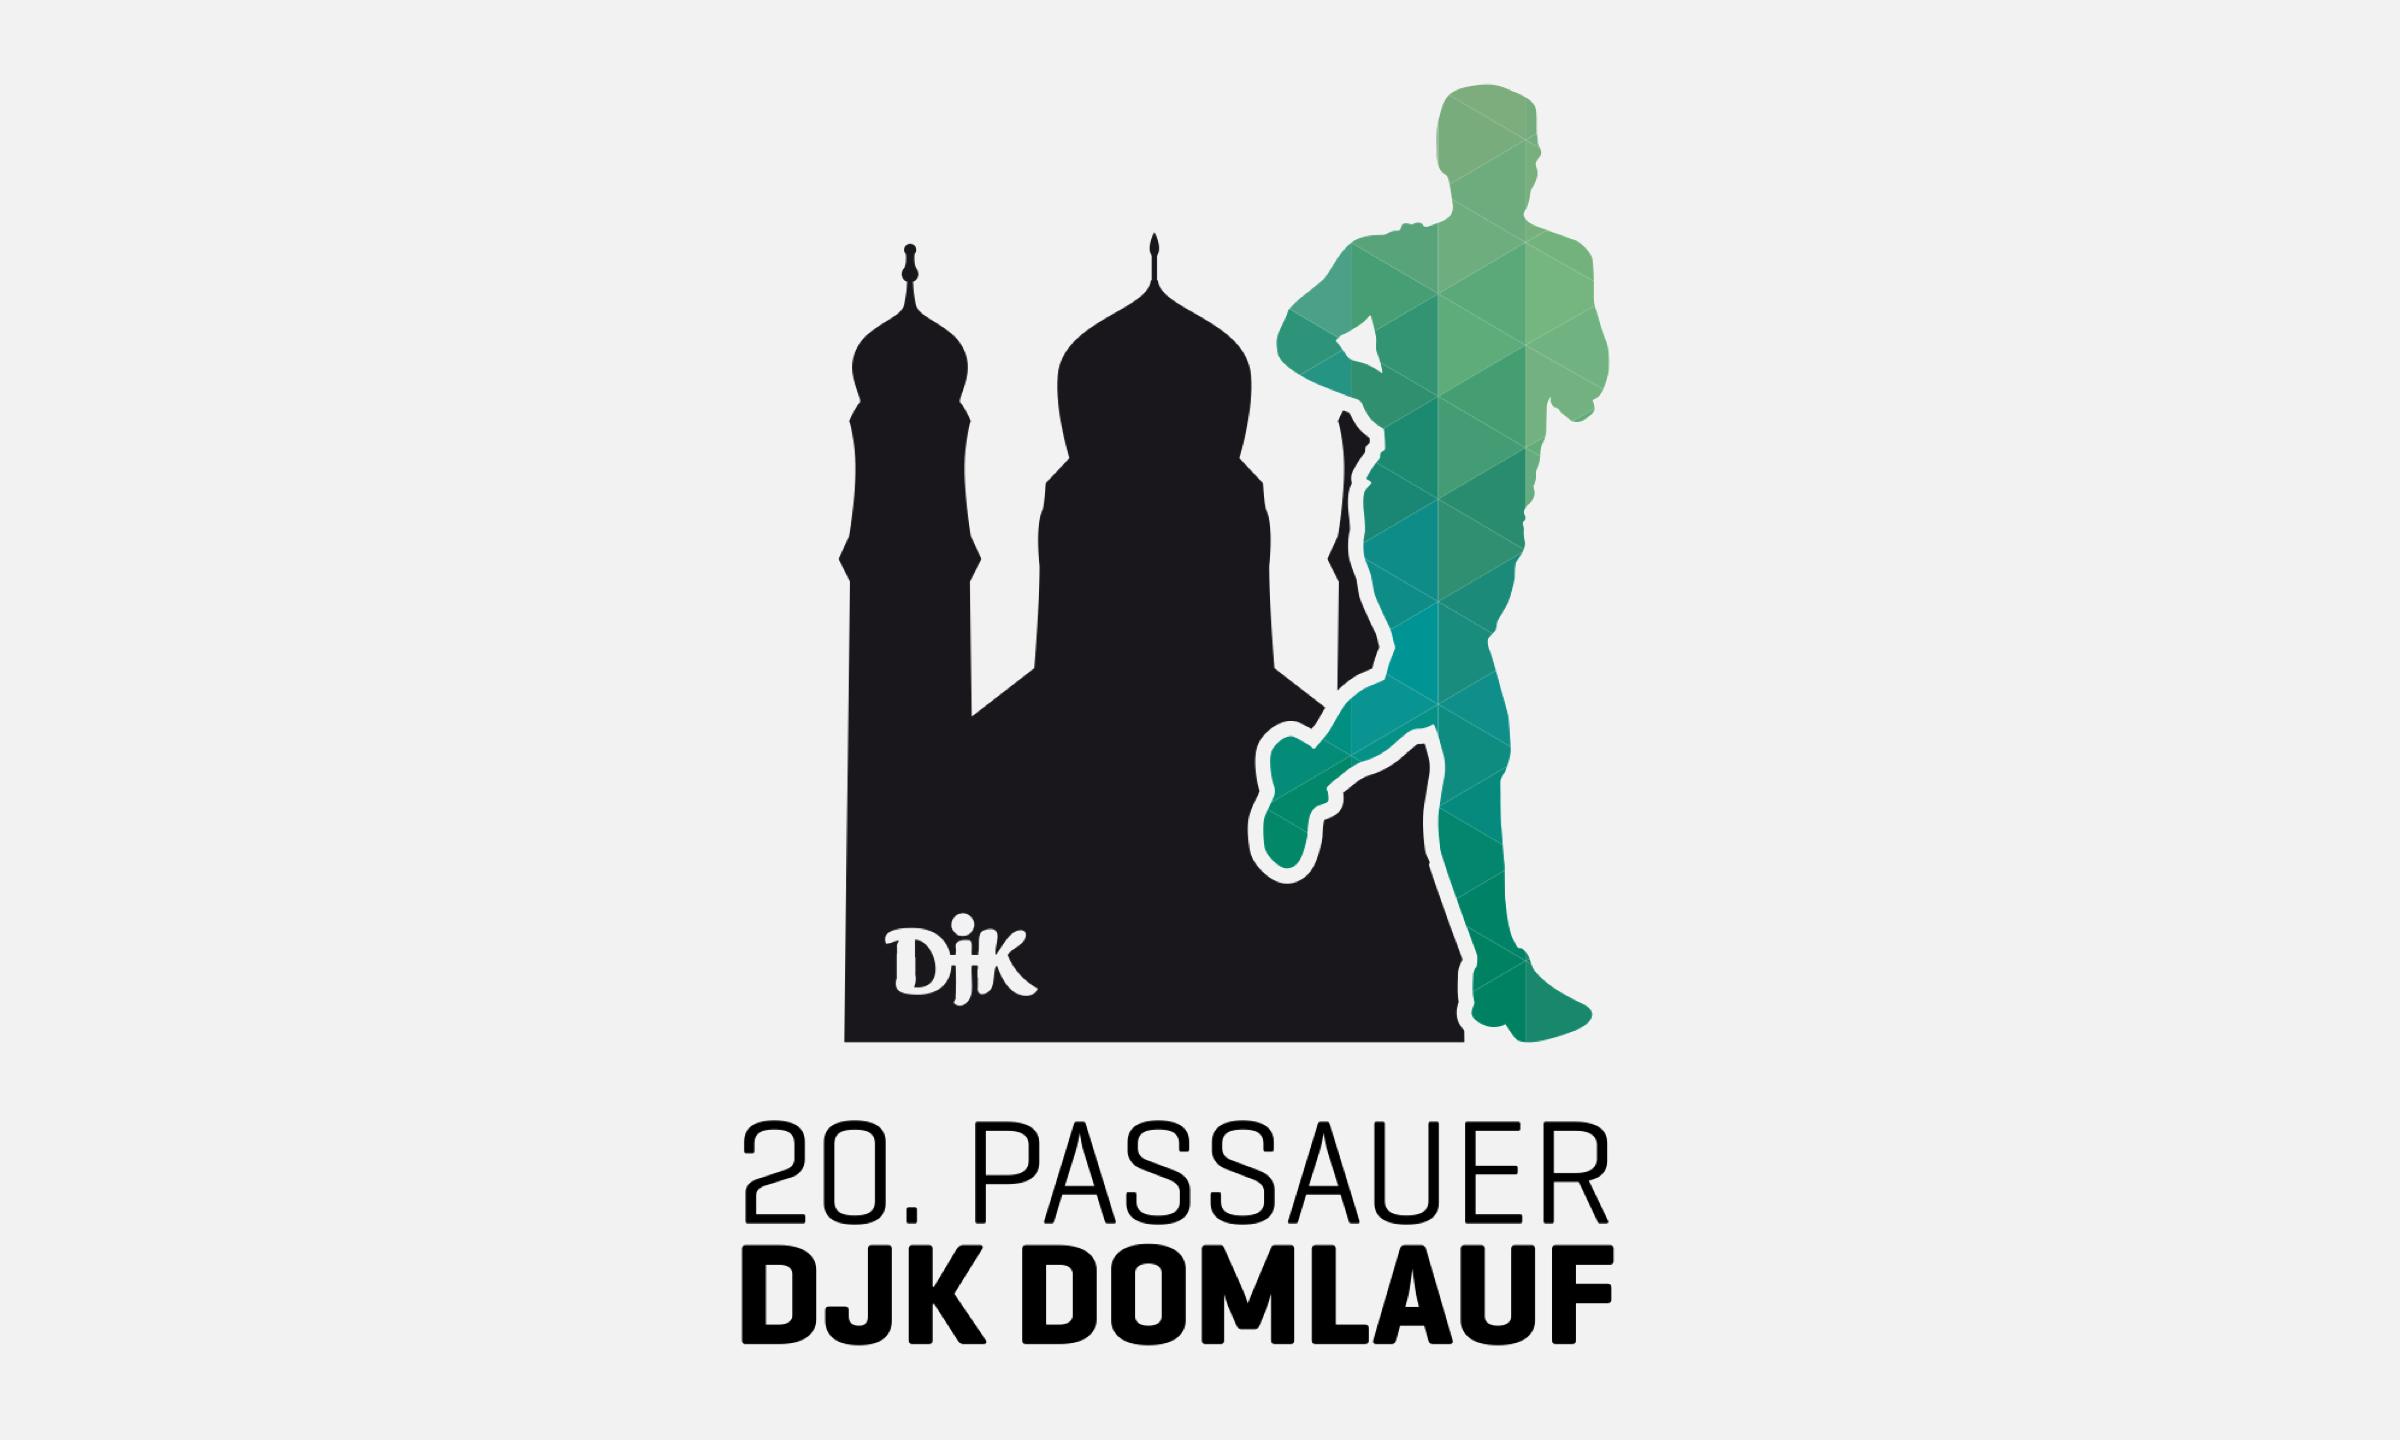 2019 Raete Verbaende Djk 20 Domlauf Passau